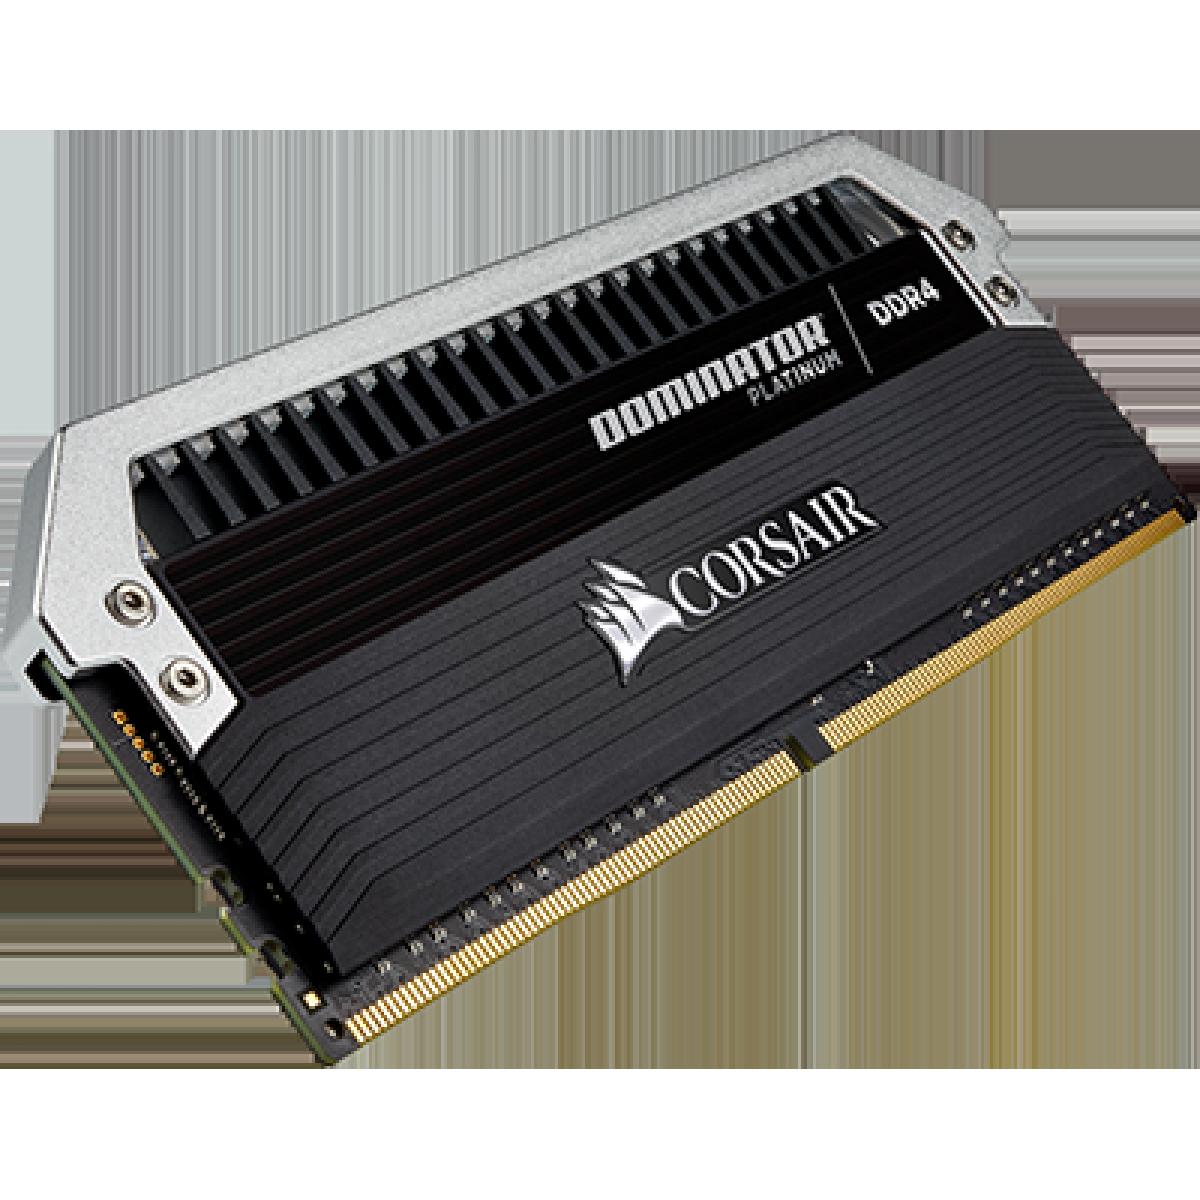 Memória DDR4 Corsair Dominator Platinum, 16GB (2x8GB), 3200MHz, CMD16GX4M2B3200C16